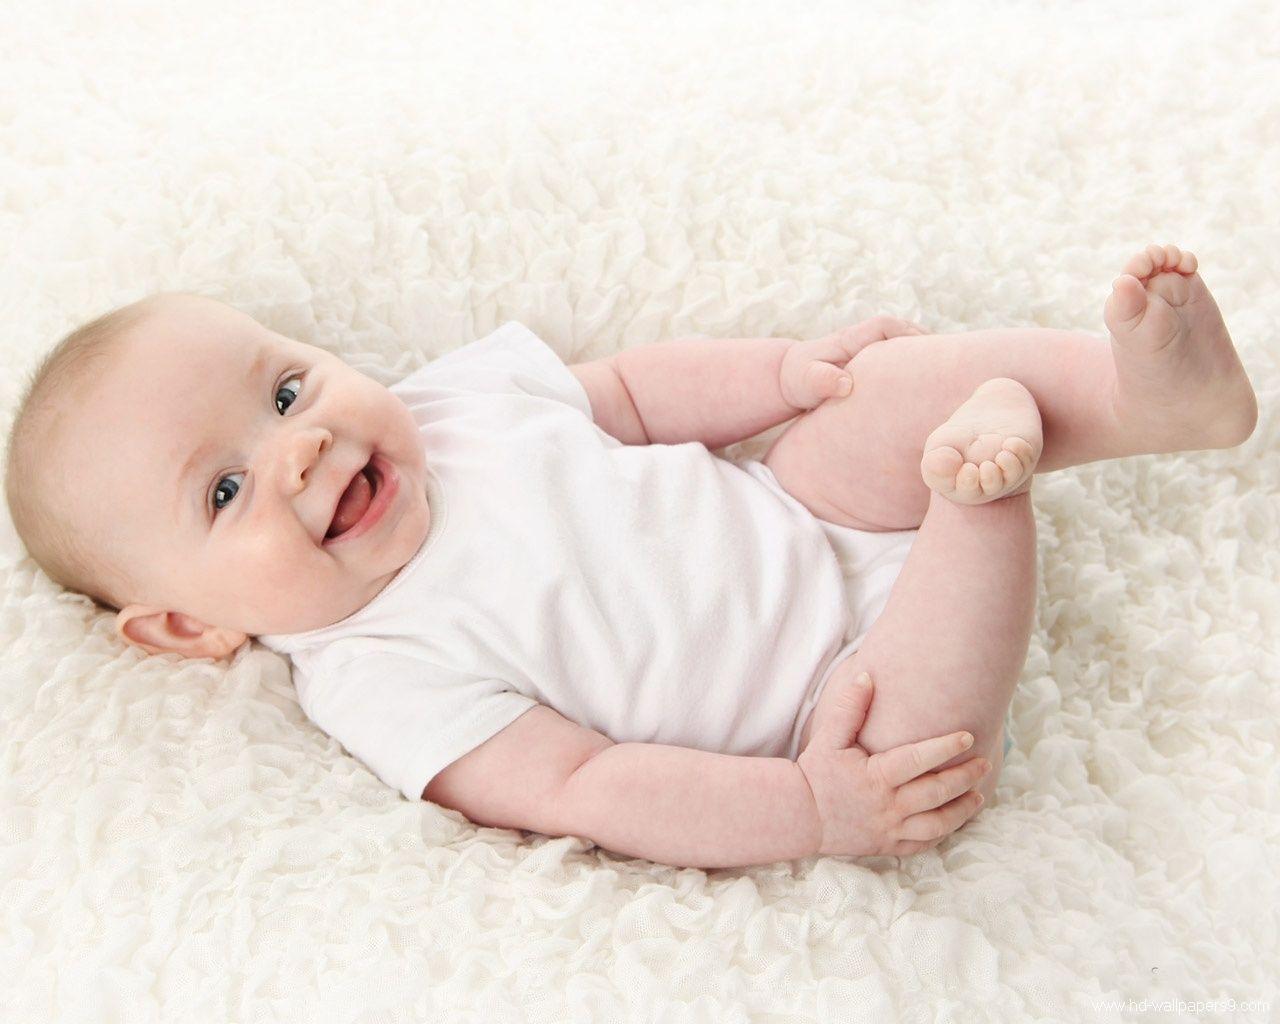 Baby Wallpaper 48 Wallpapers Hd Wallpapers Baby Wallpaper Hd Baby Wallpaper Cute Baby Pictures